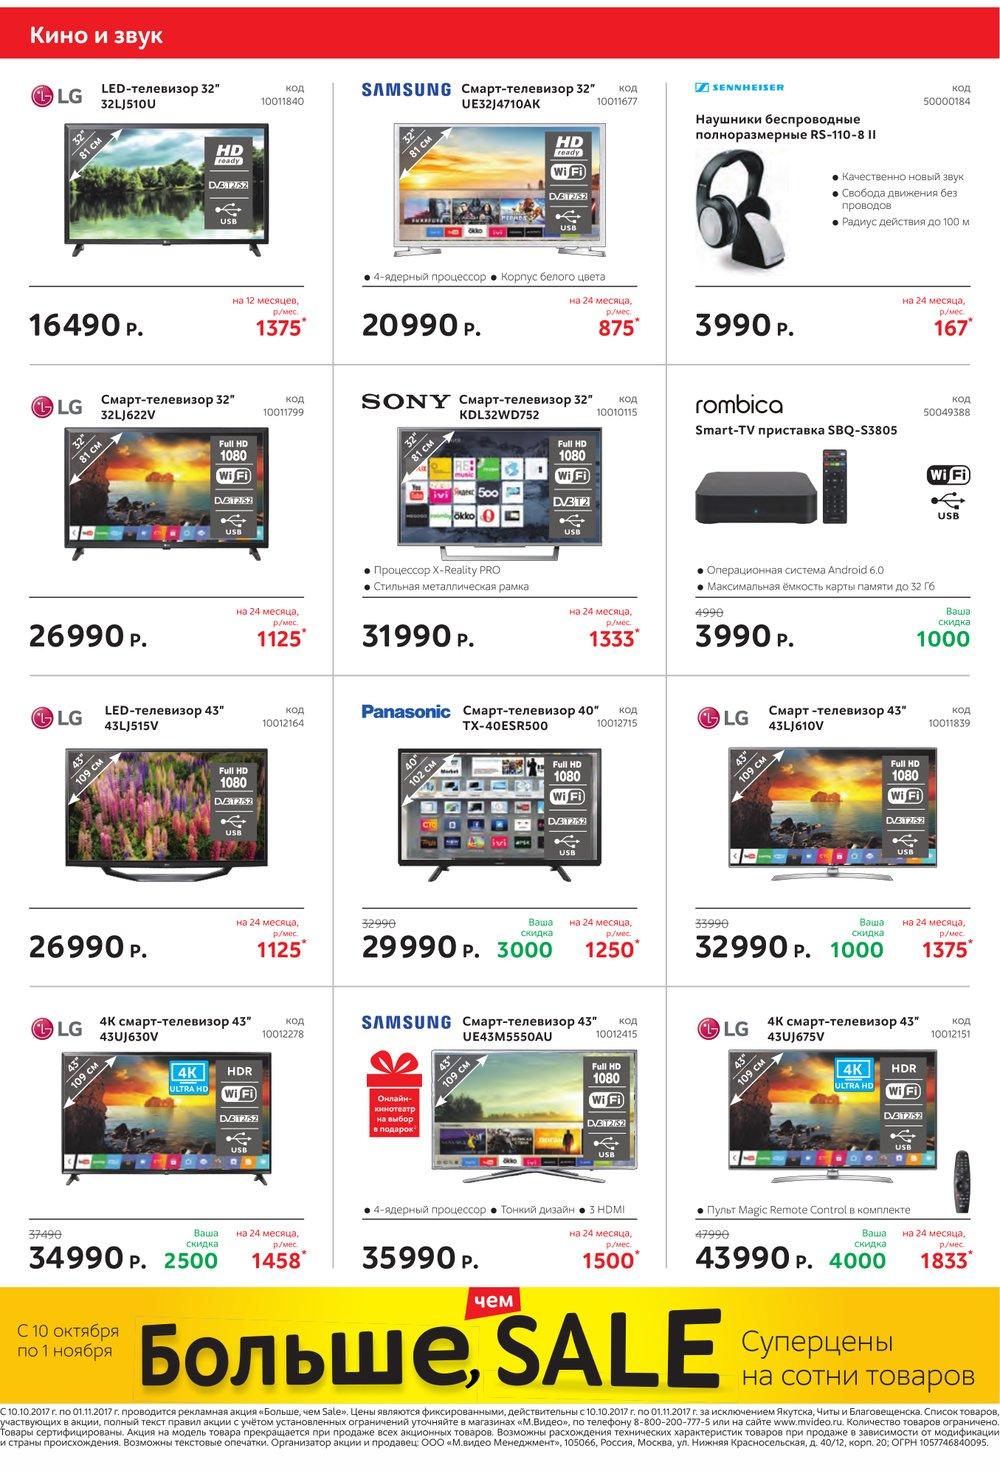 Каталог акций М.Видео с 10 октября по 1 ноября 2017 - стр. 2